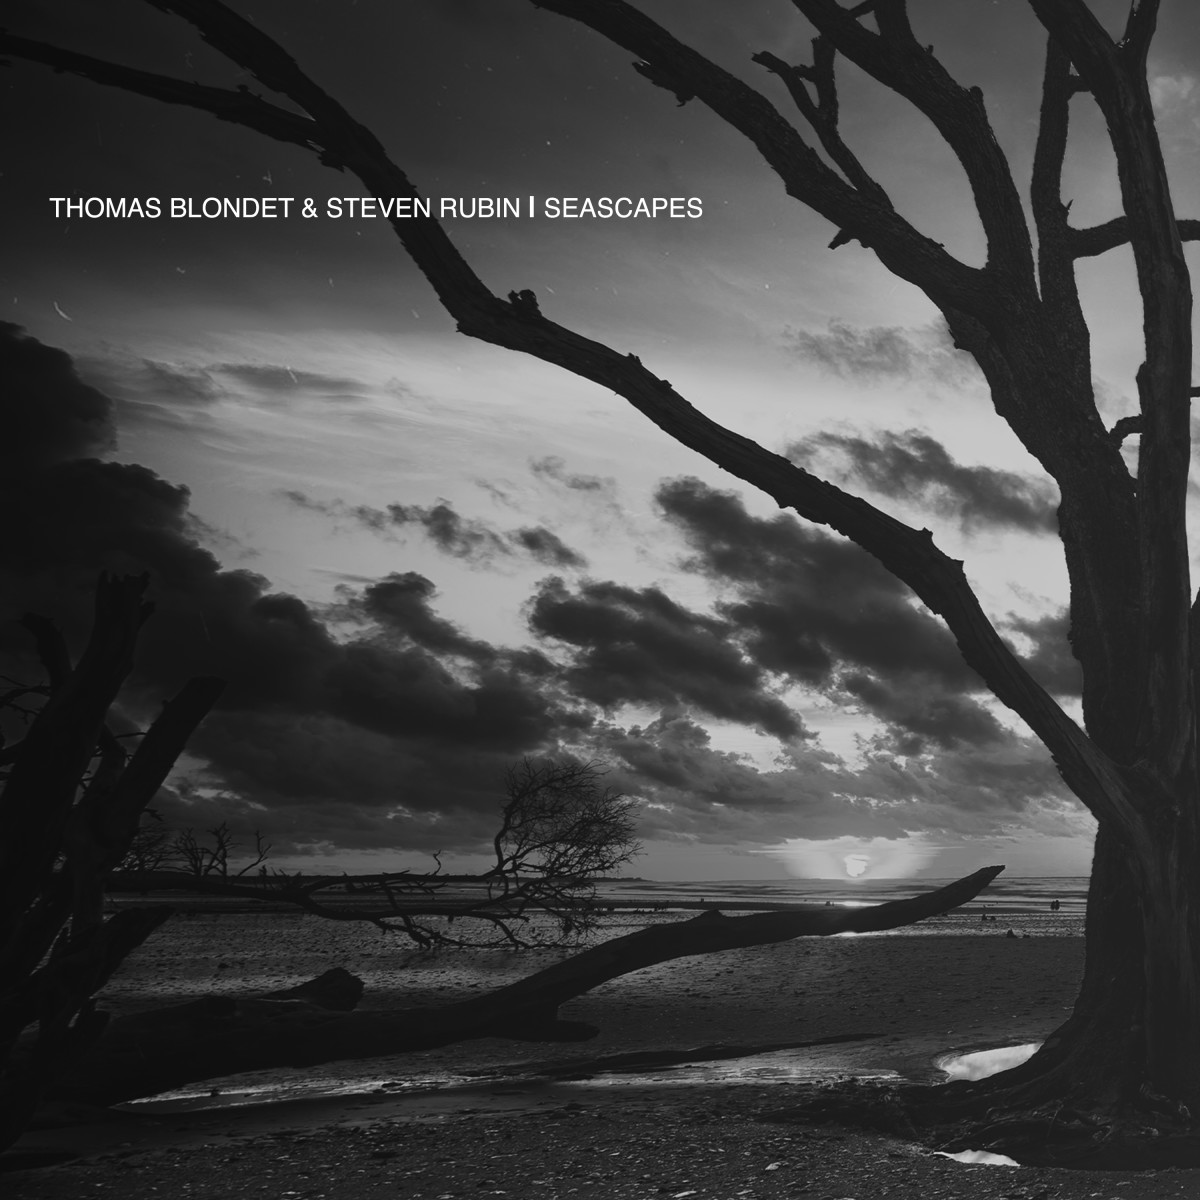 Thomas Blondet & Steven Rubin - Seascapes [Rhythm & Culture Music]